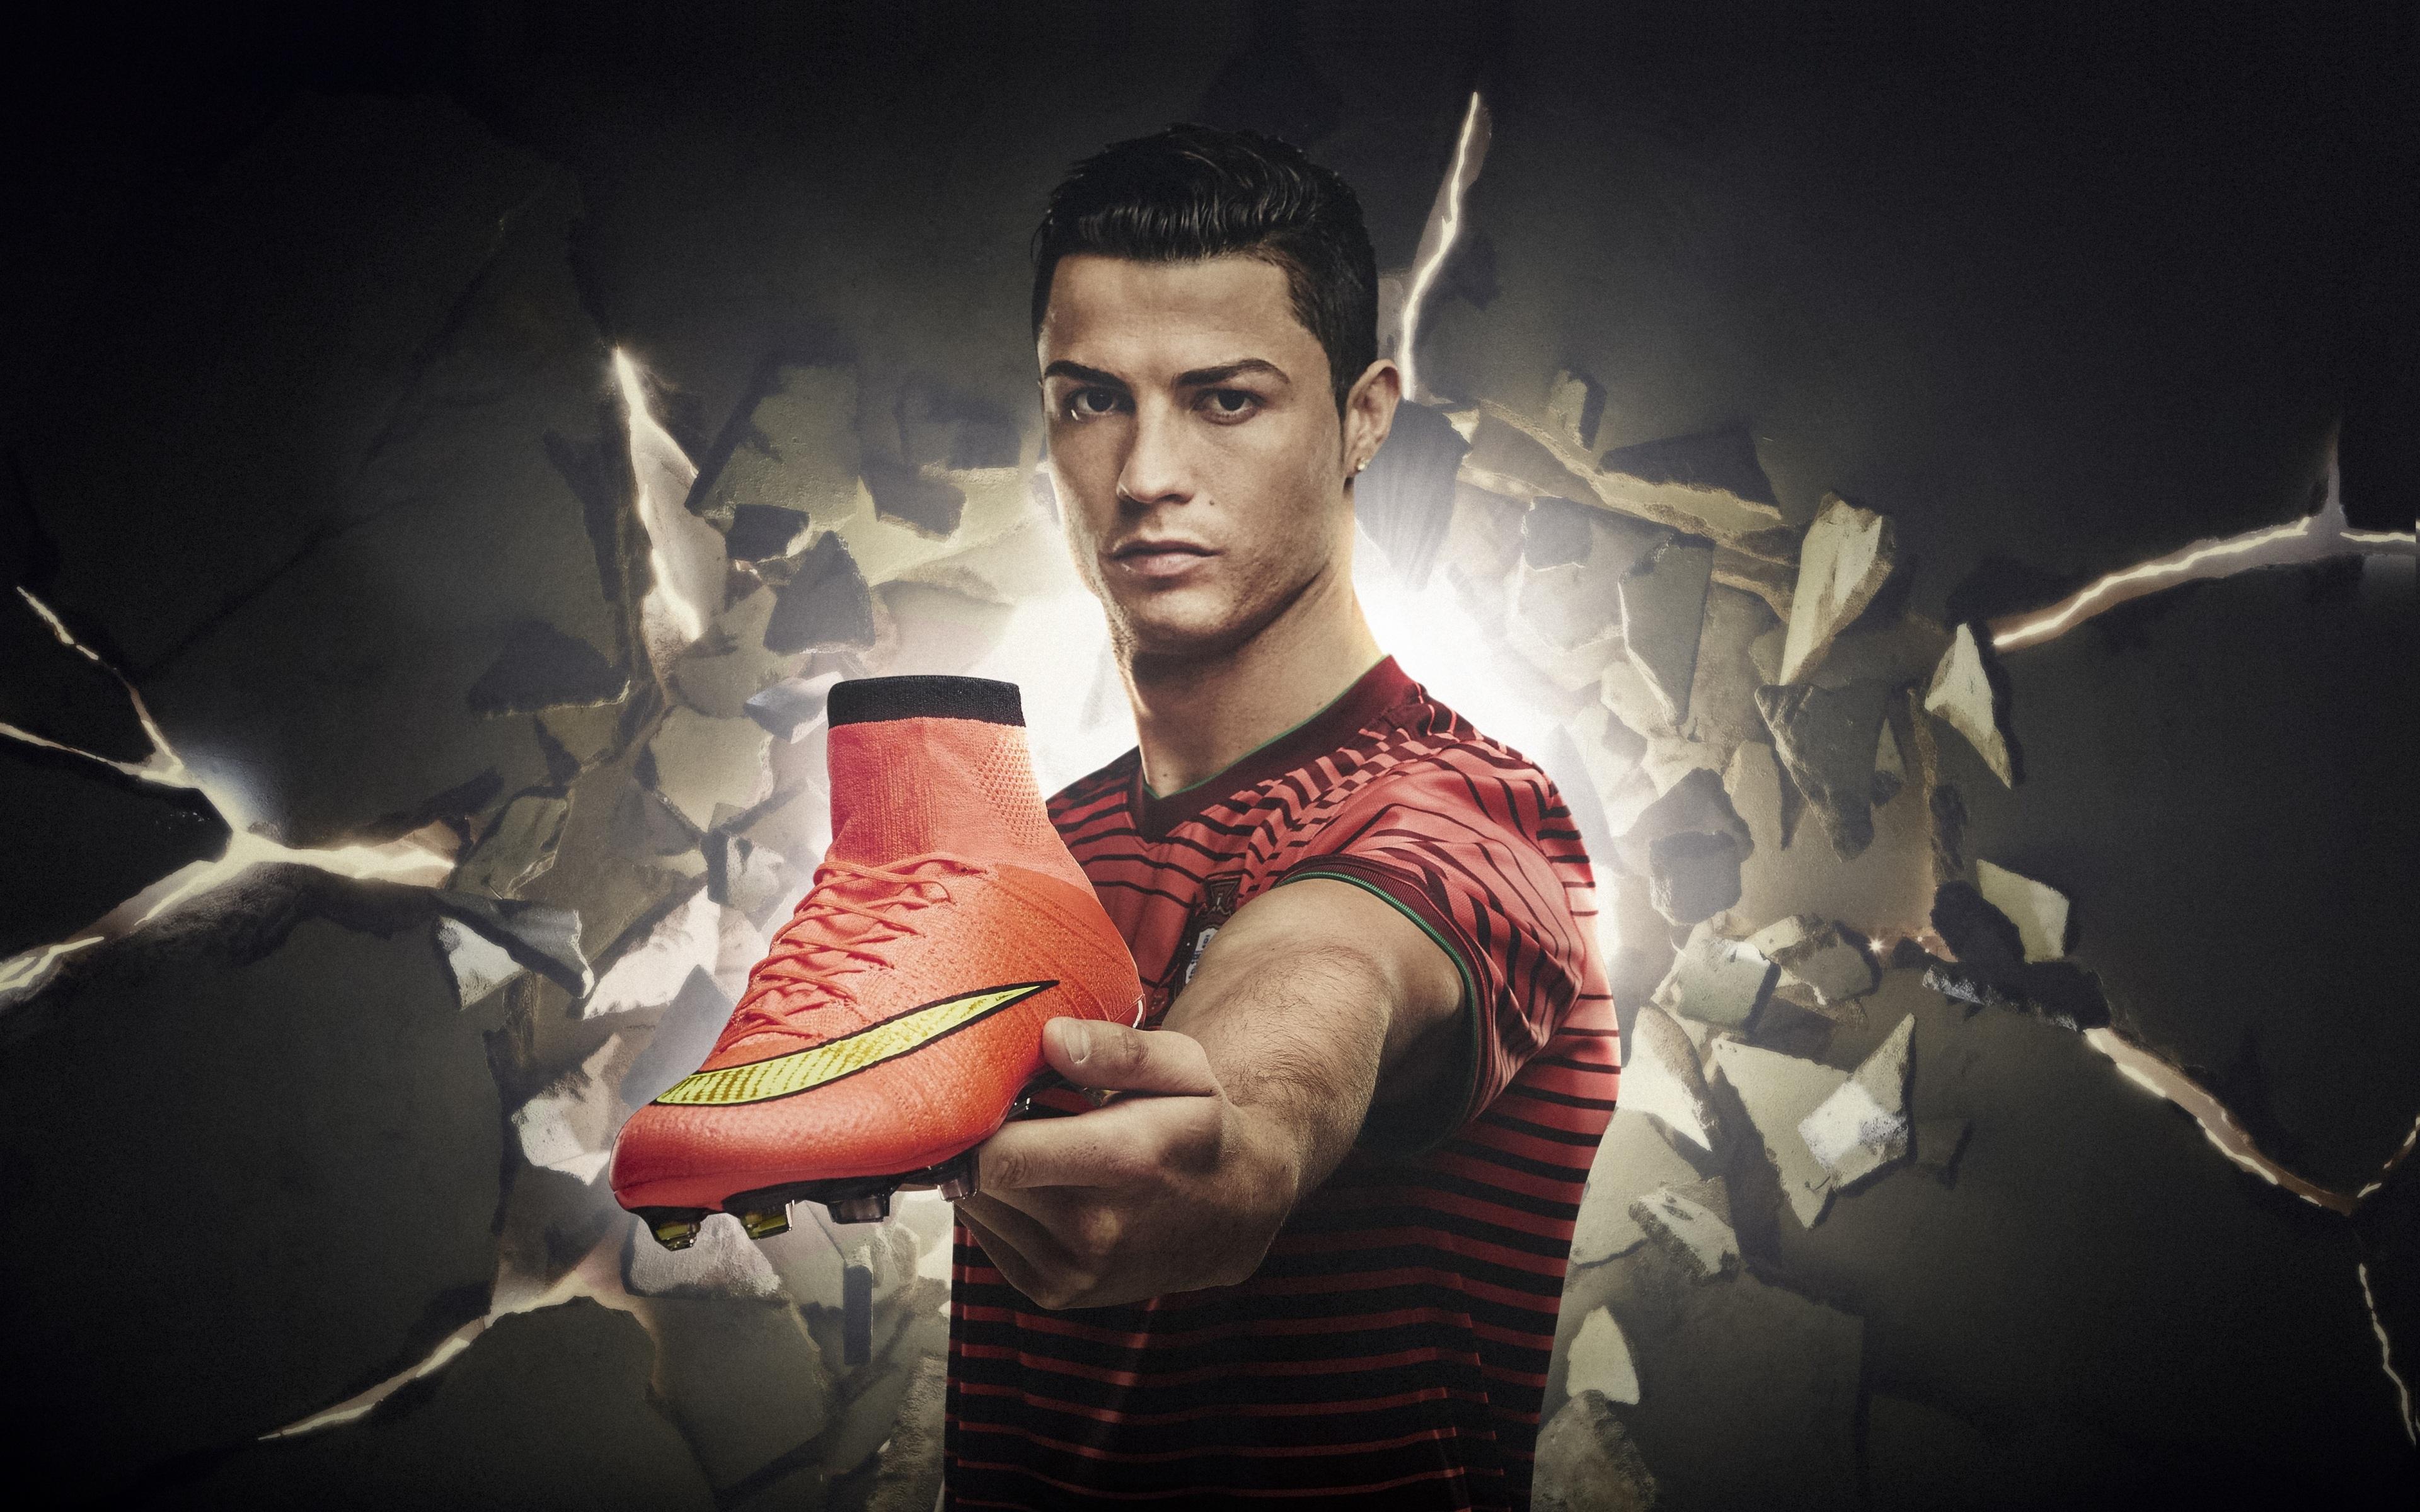 Фото:Криштиану Роналду (Nike)